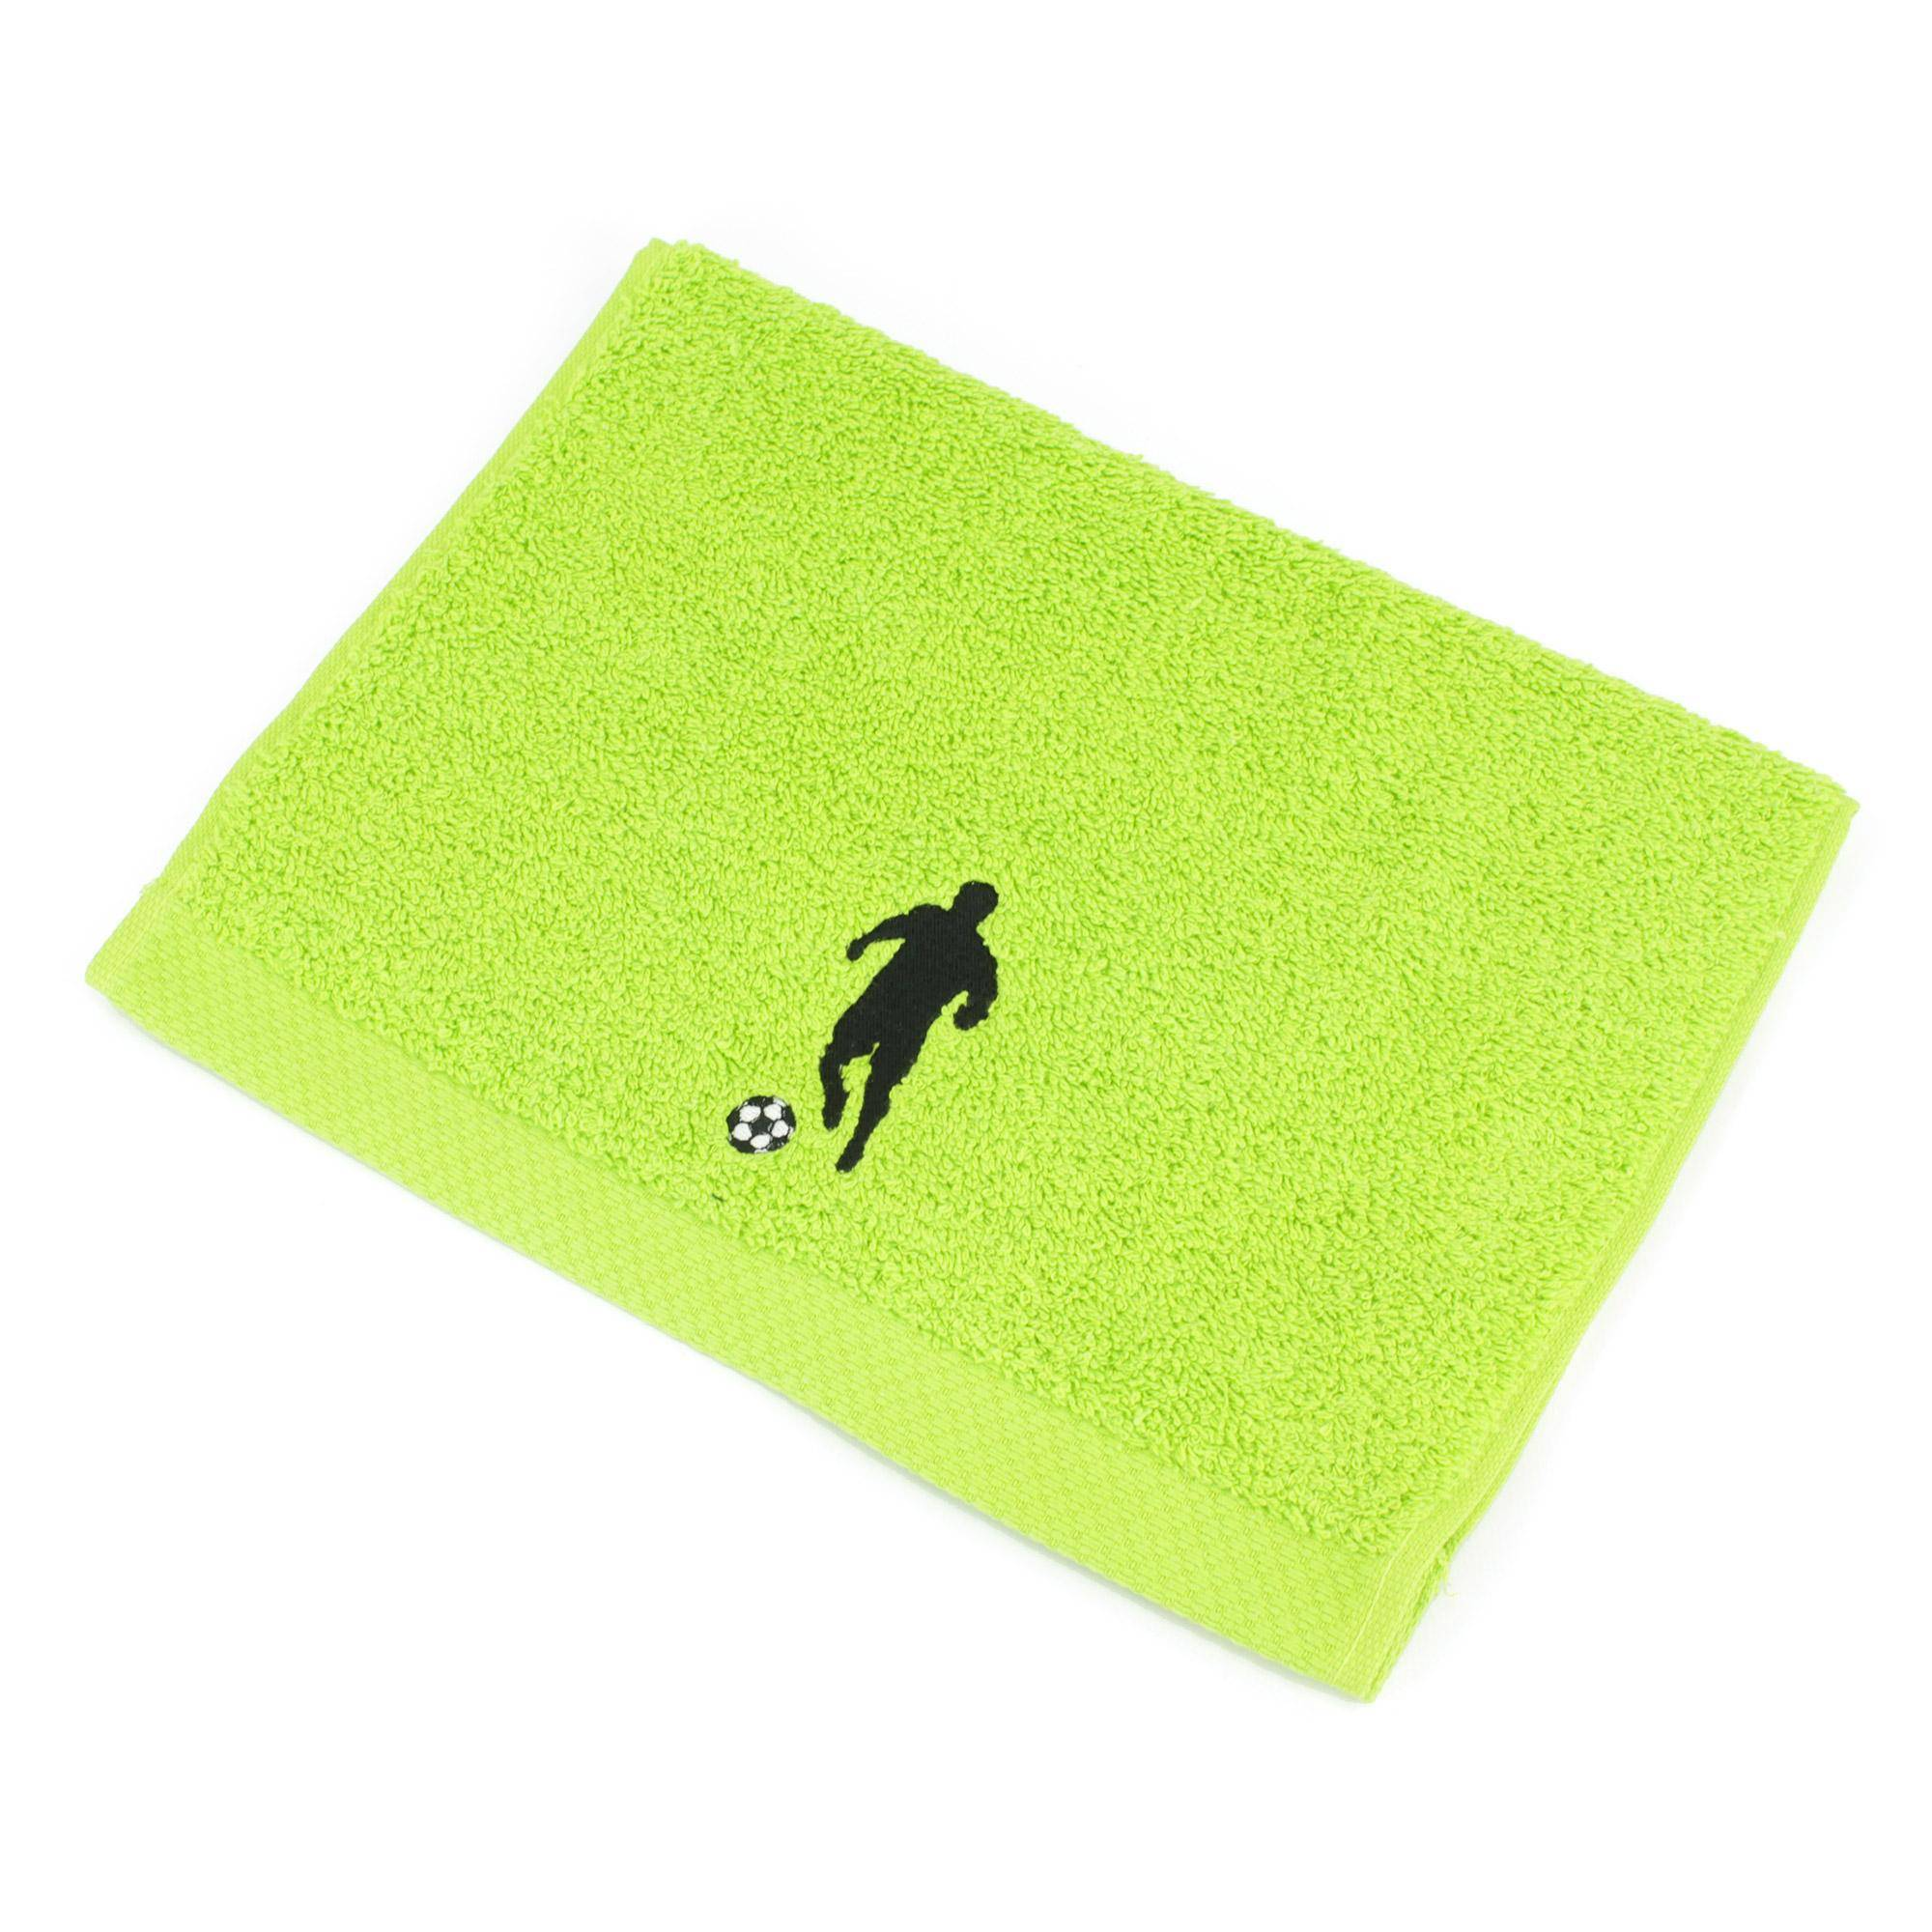 Linnea Serviette invite 33x50 cm 100% coton 550 g/m2 PURE FOOTBALL Vert Pistache